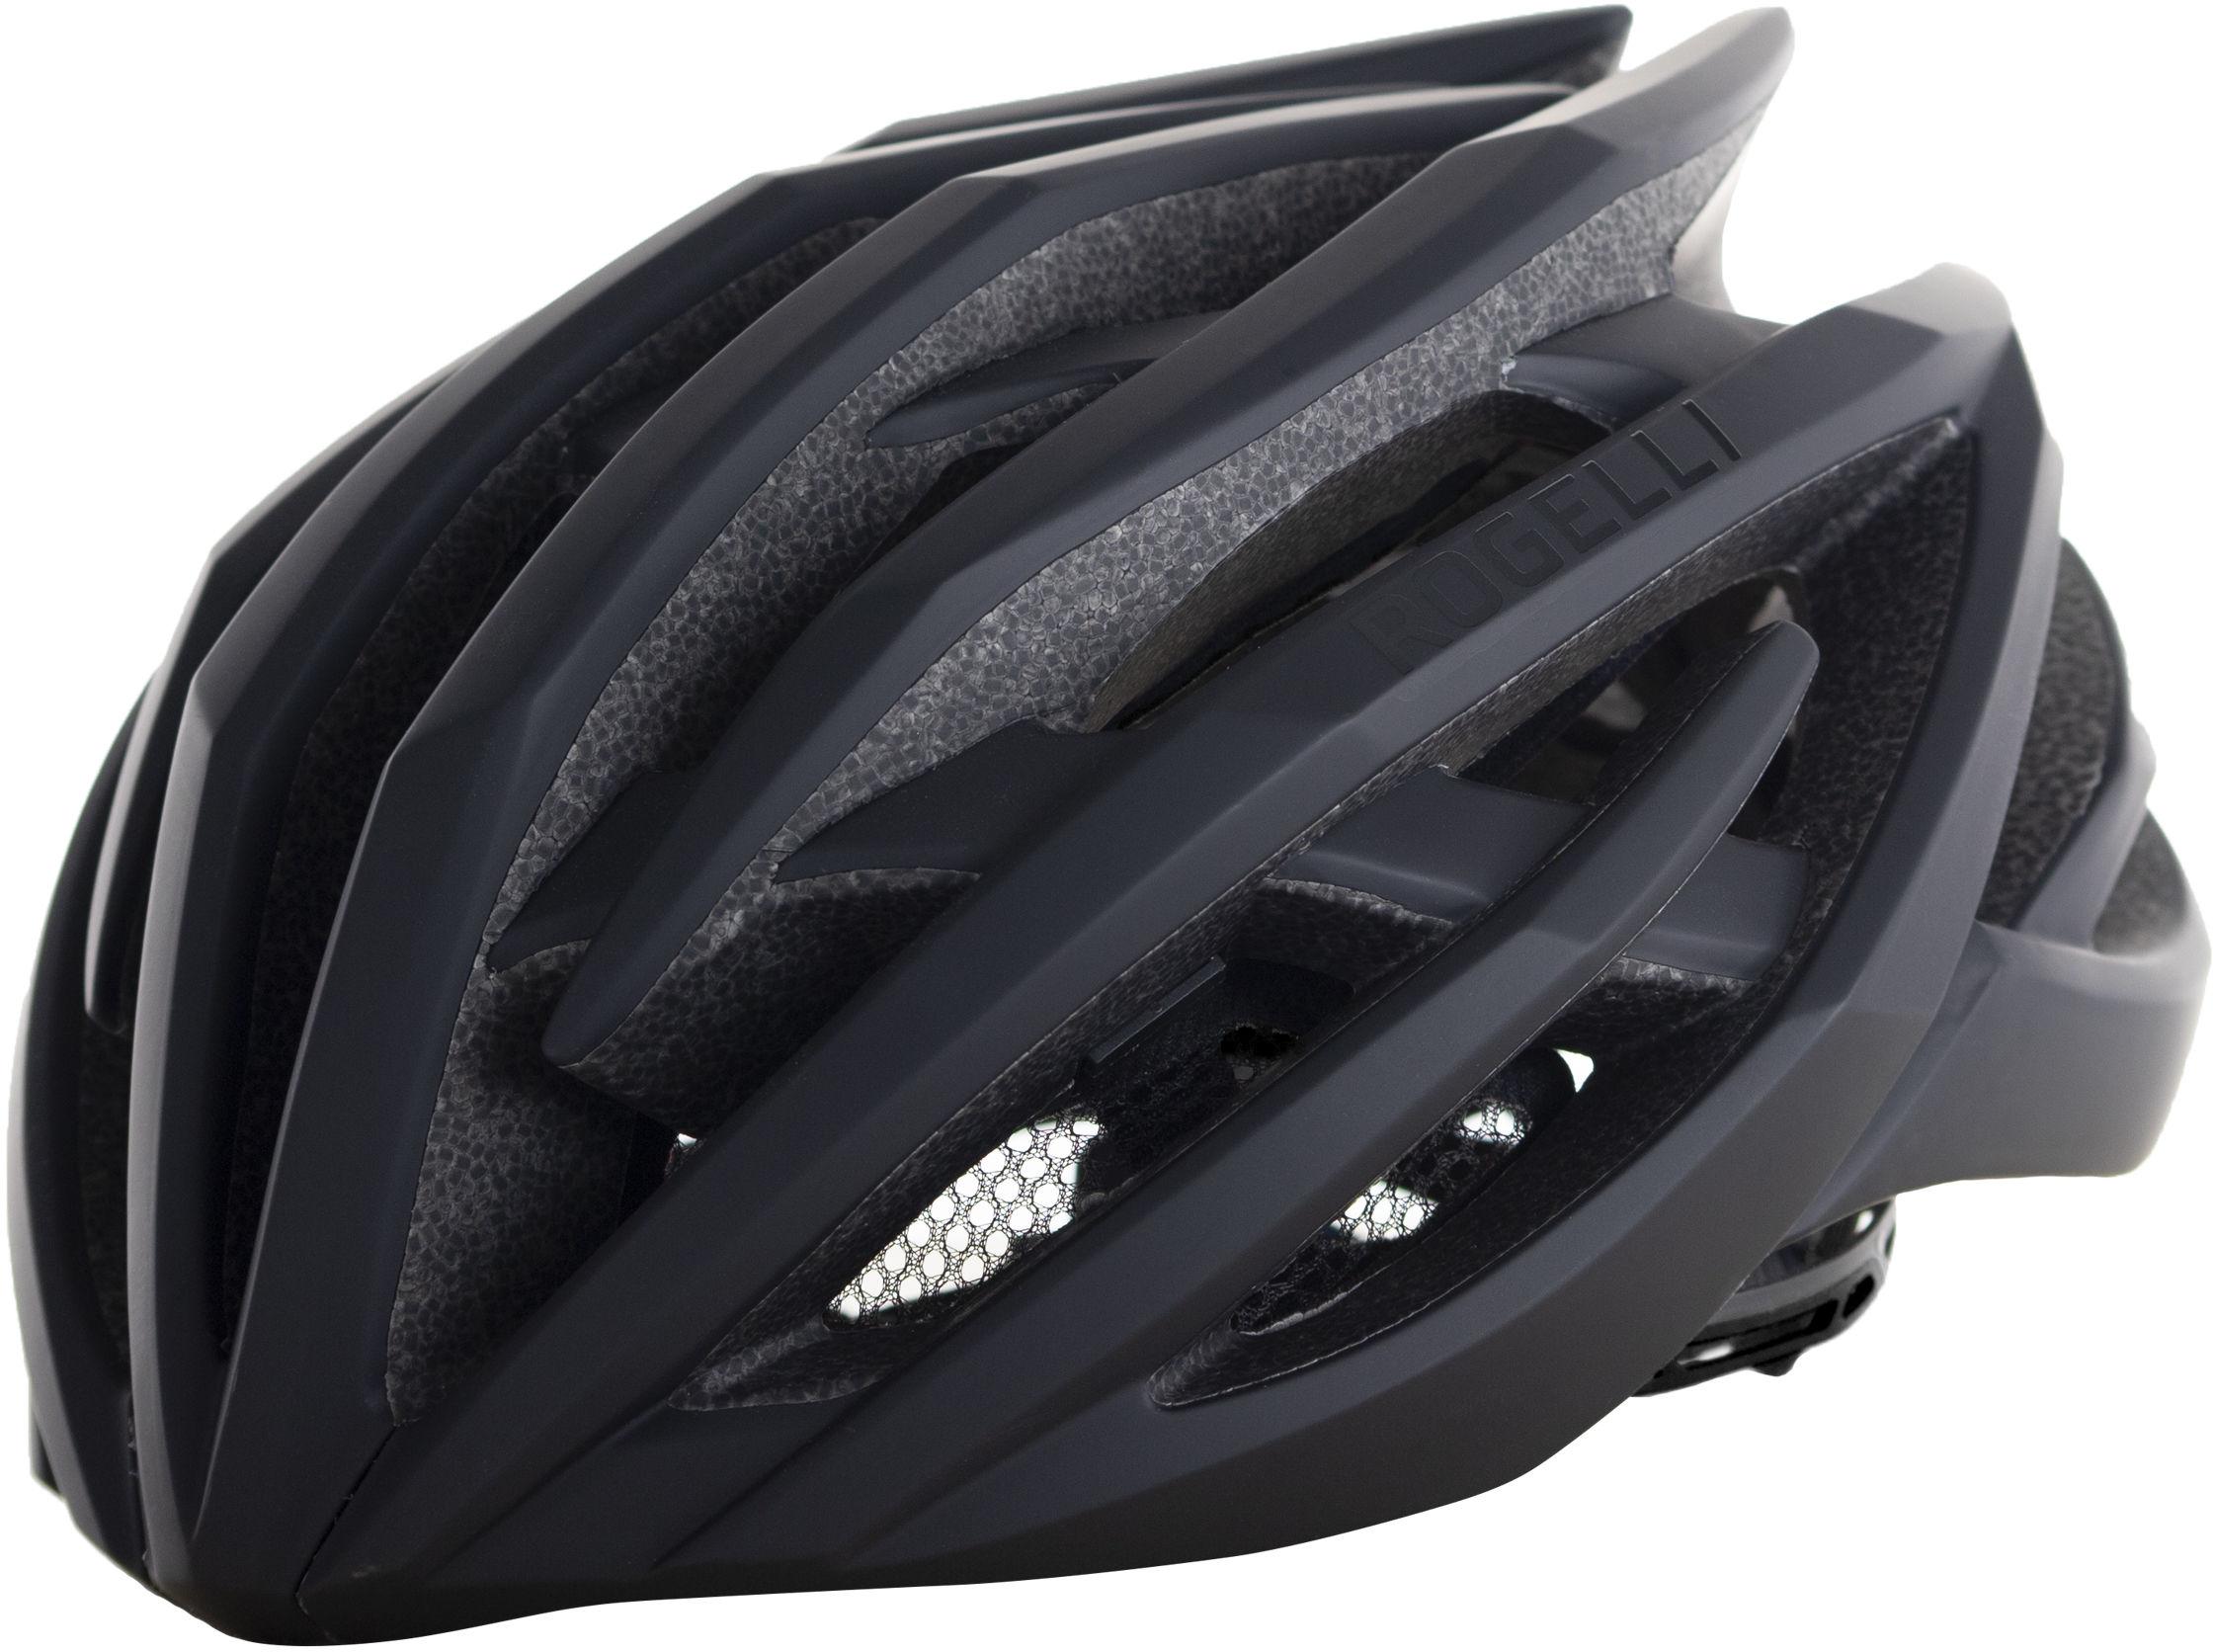 ROGELLI Tecta Kask rowerowy 009.810 Rozmiar: 54-58,Tecta009.810